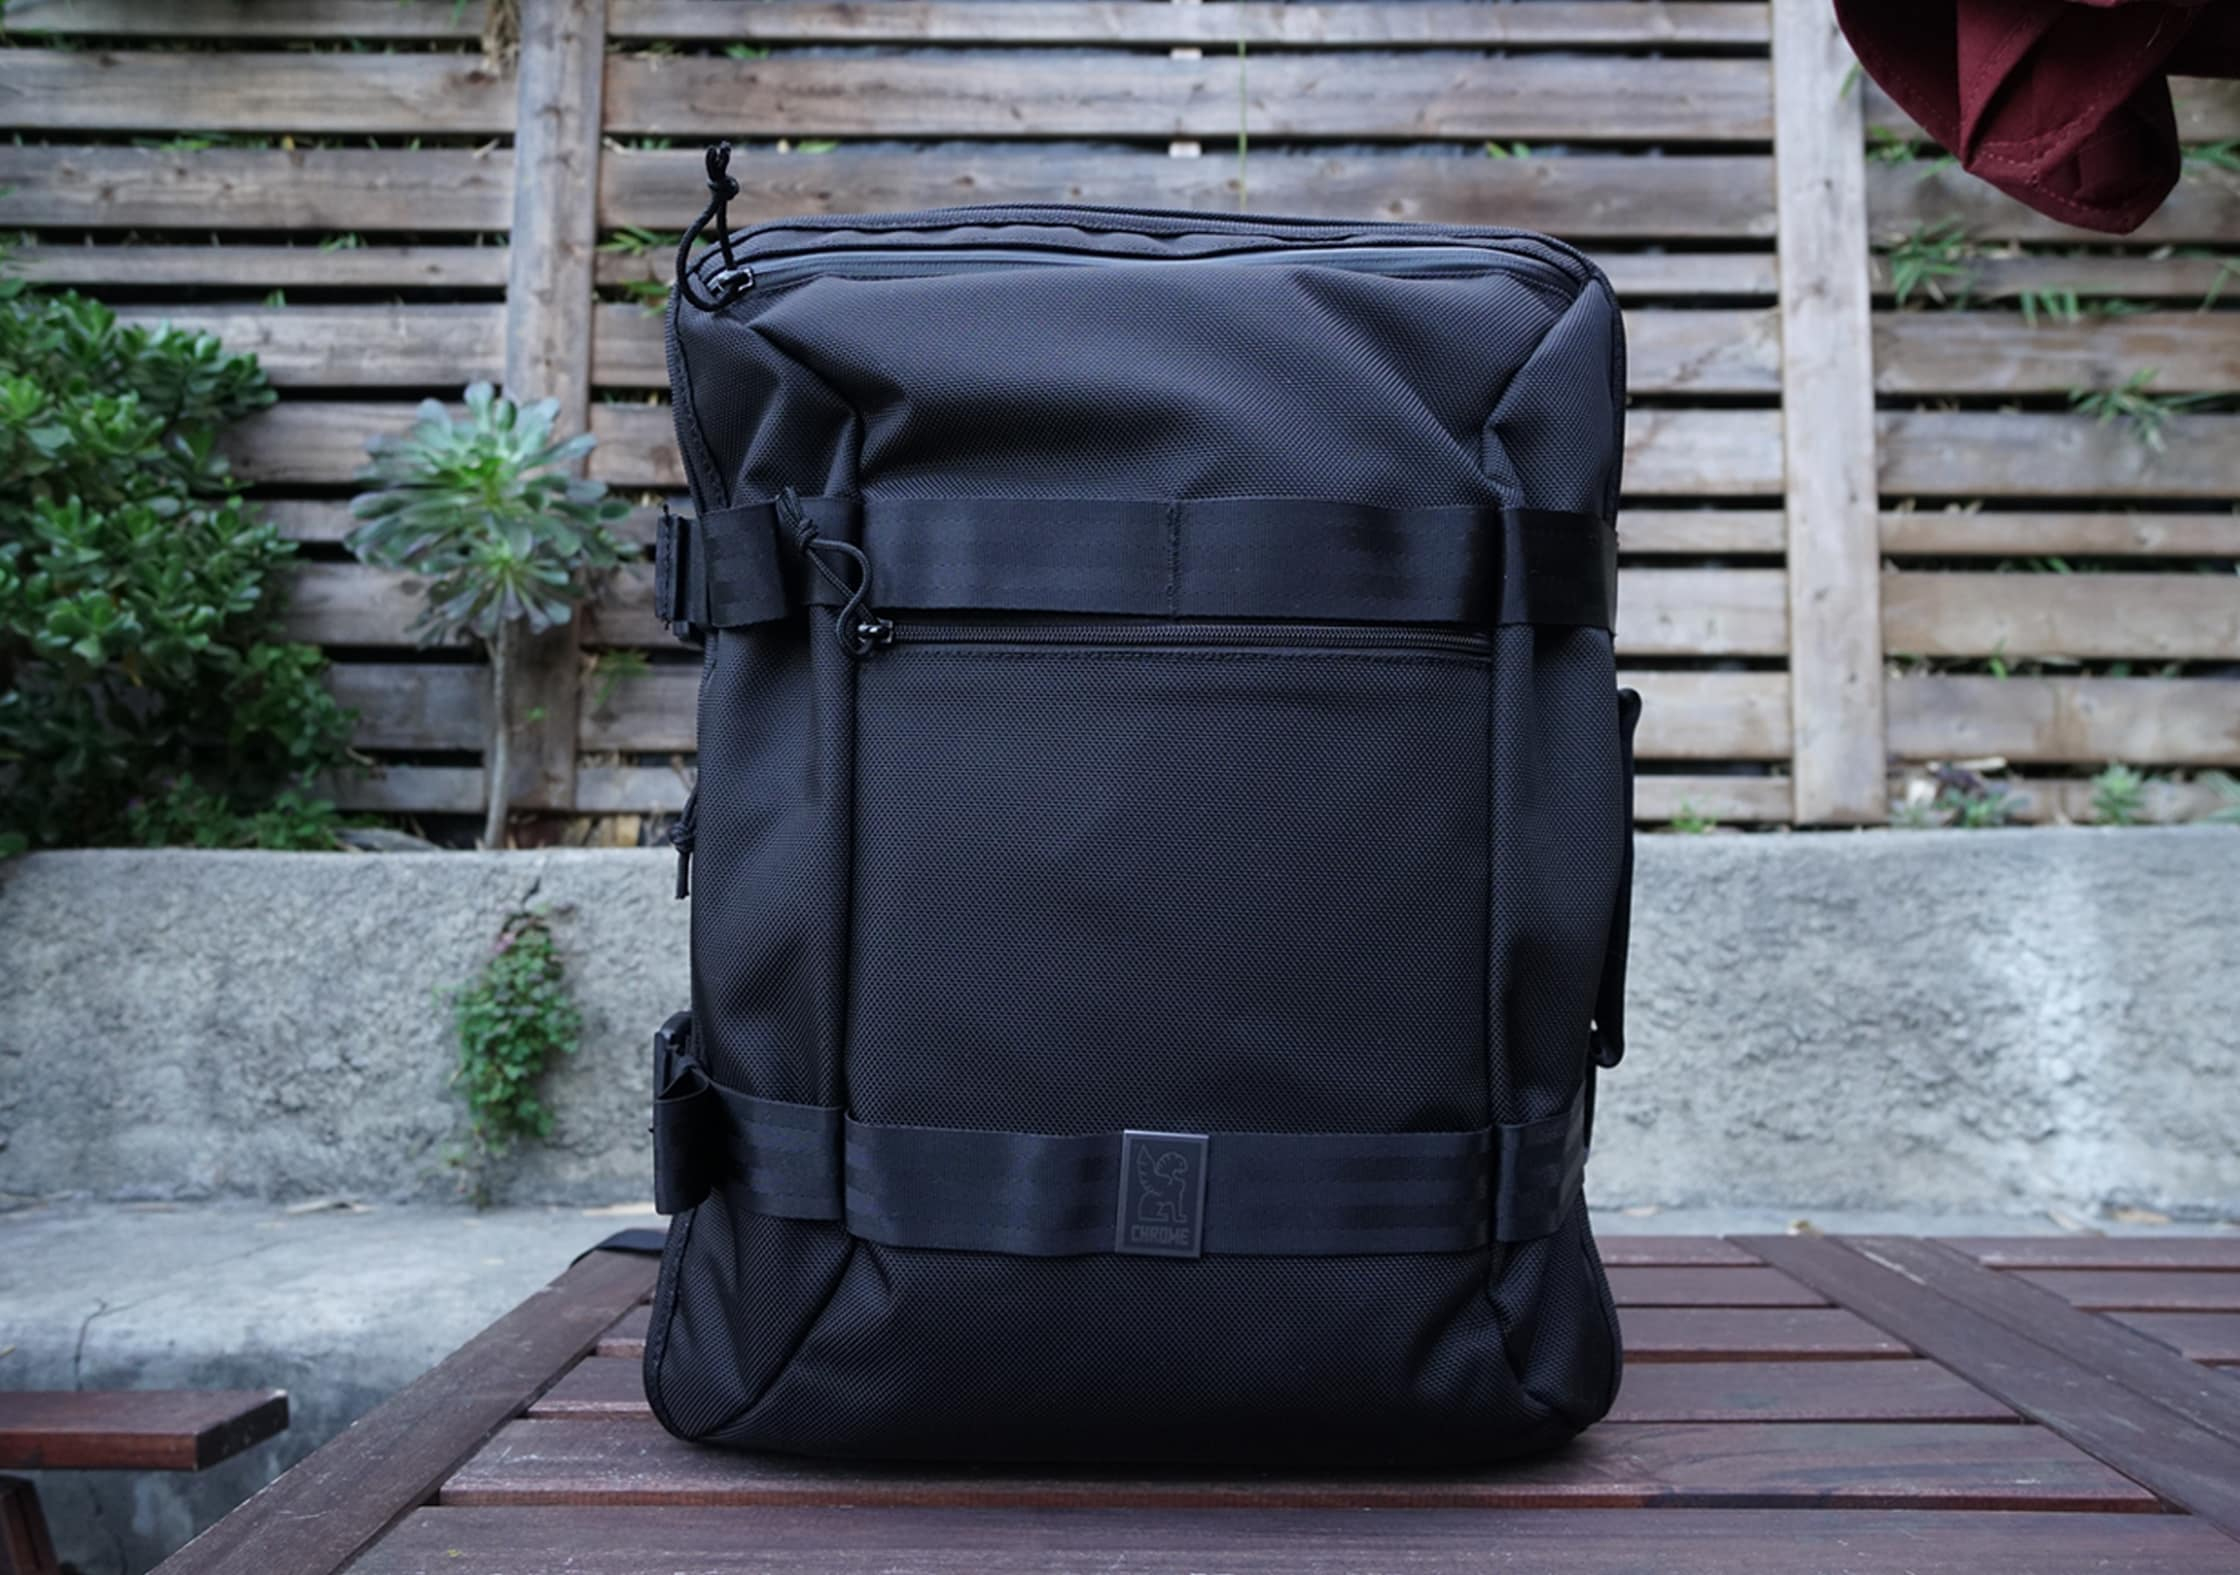 Chrome Macheto Travel Backpack